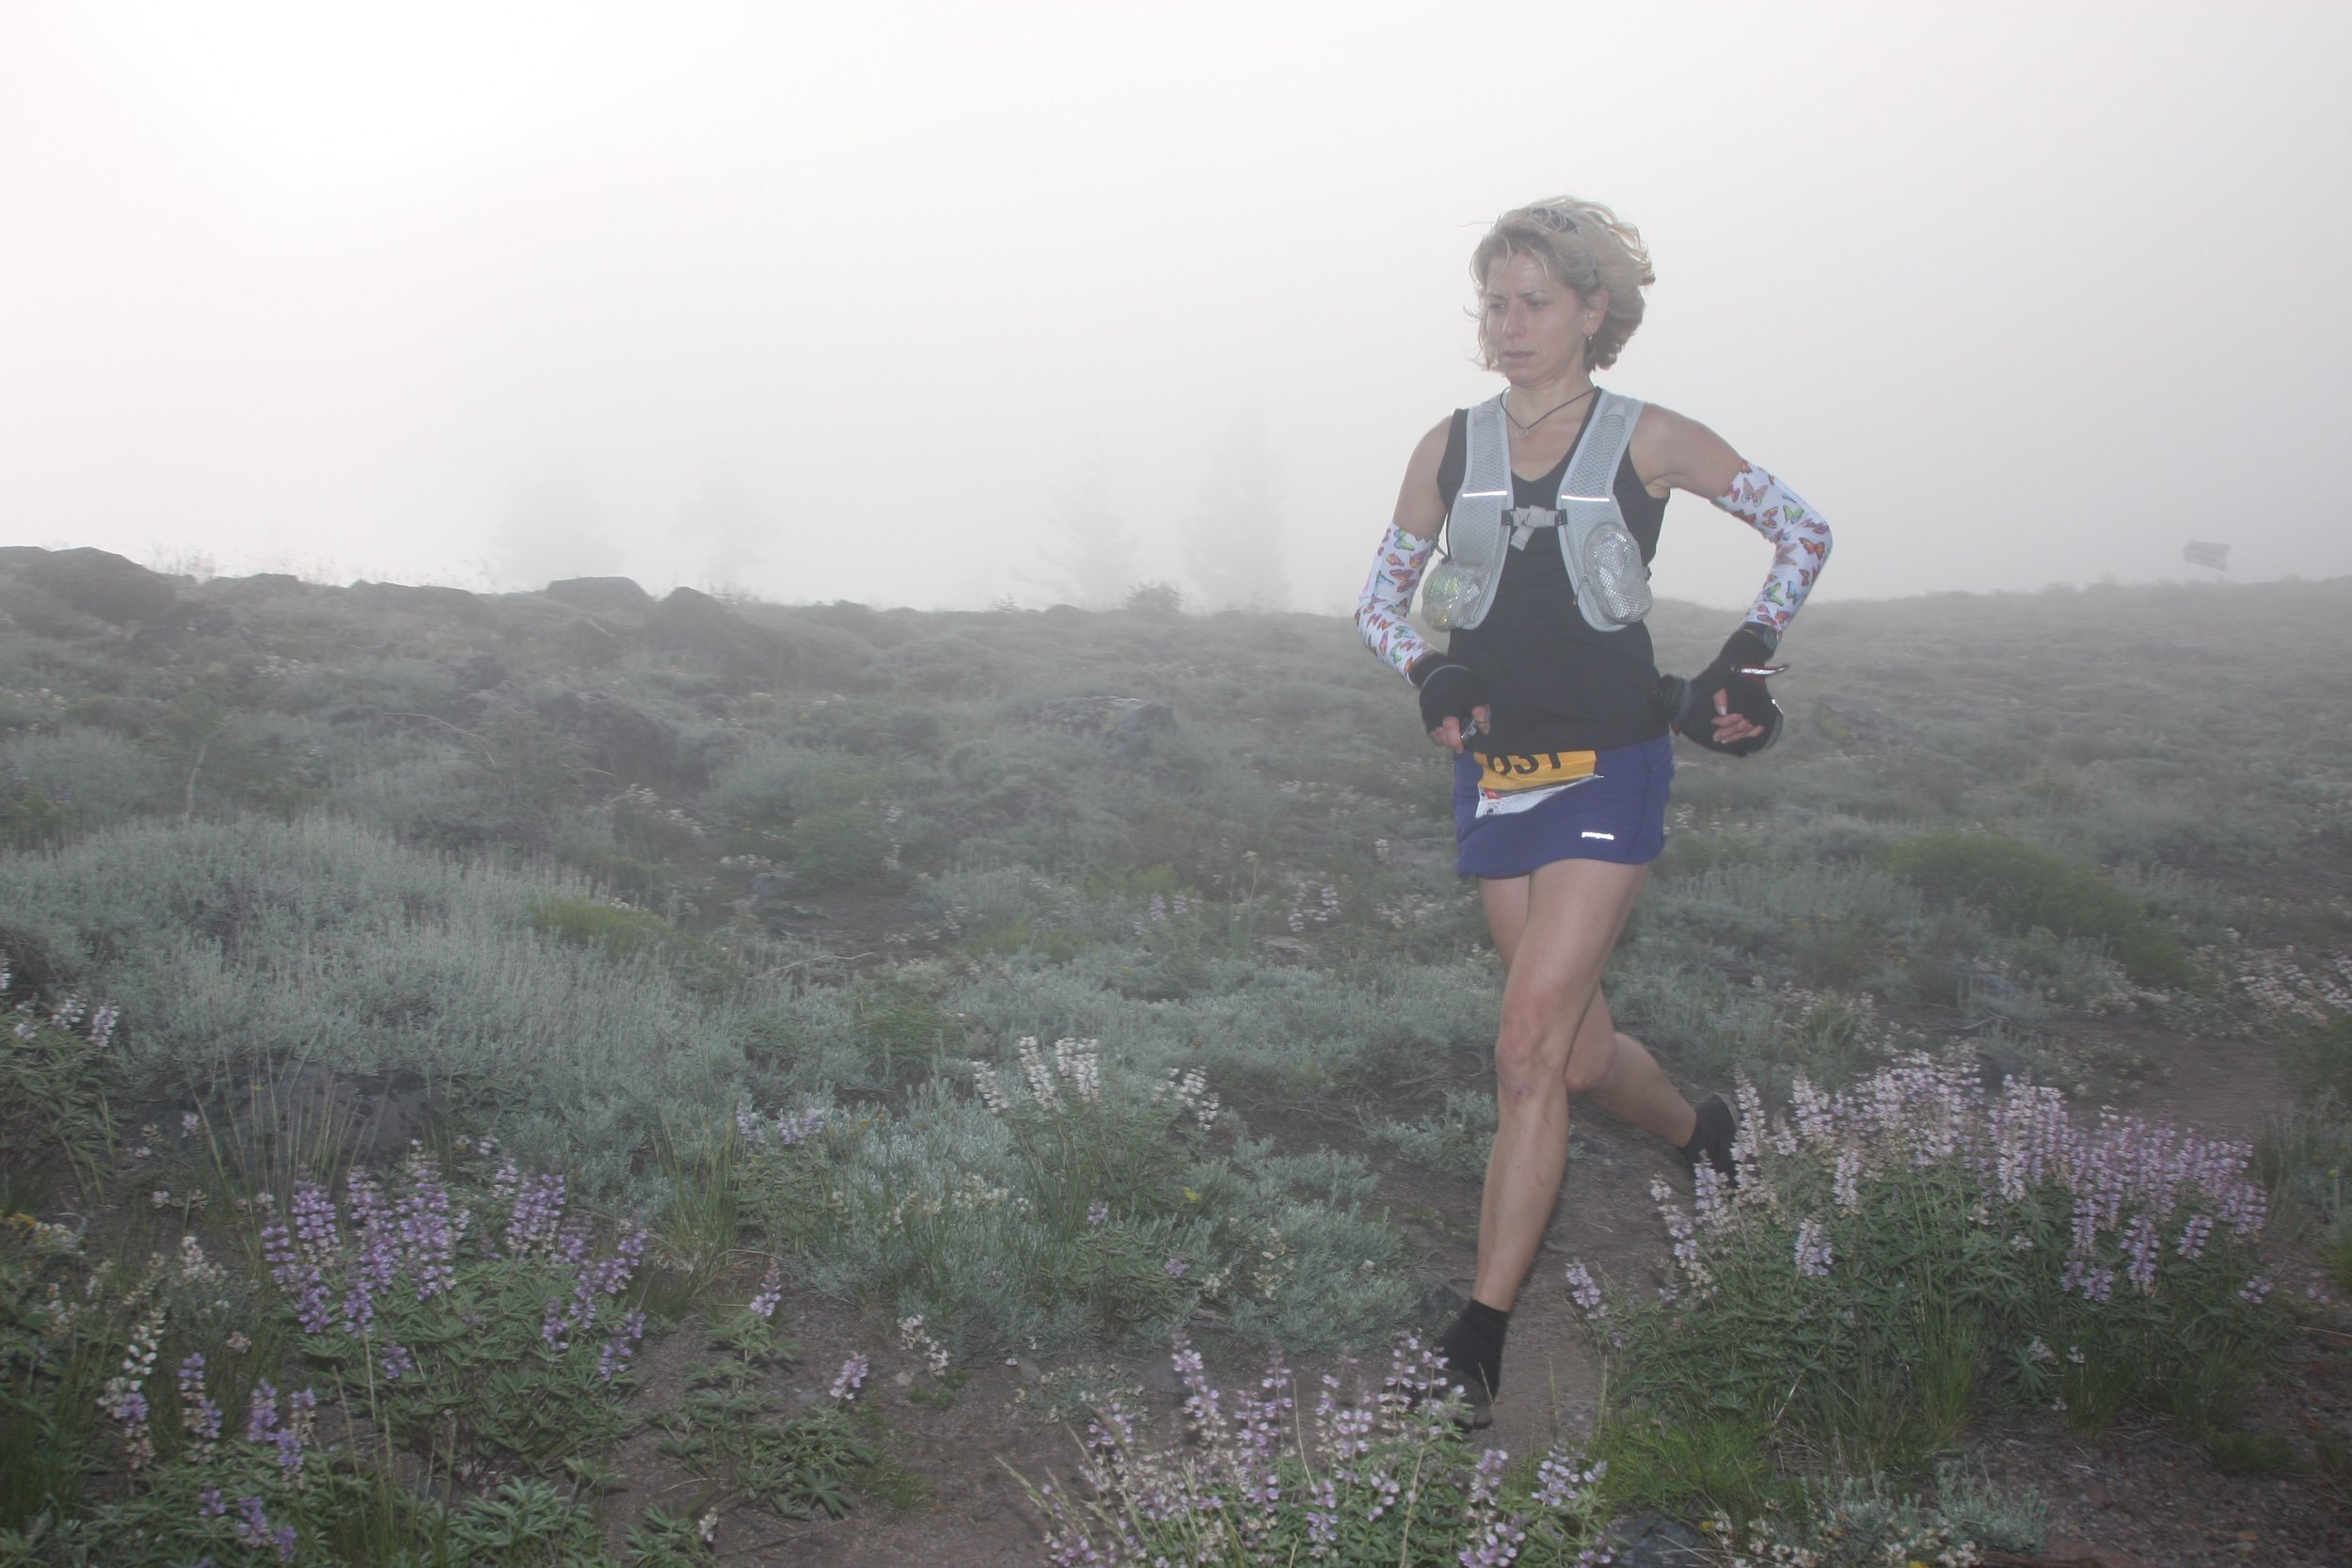 Susan Donnelly running the tough Tahoe 100-mile ultramarathon